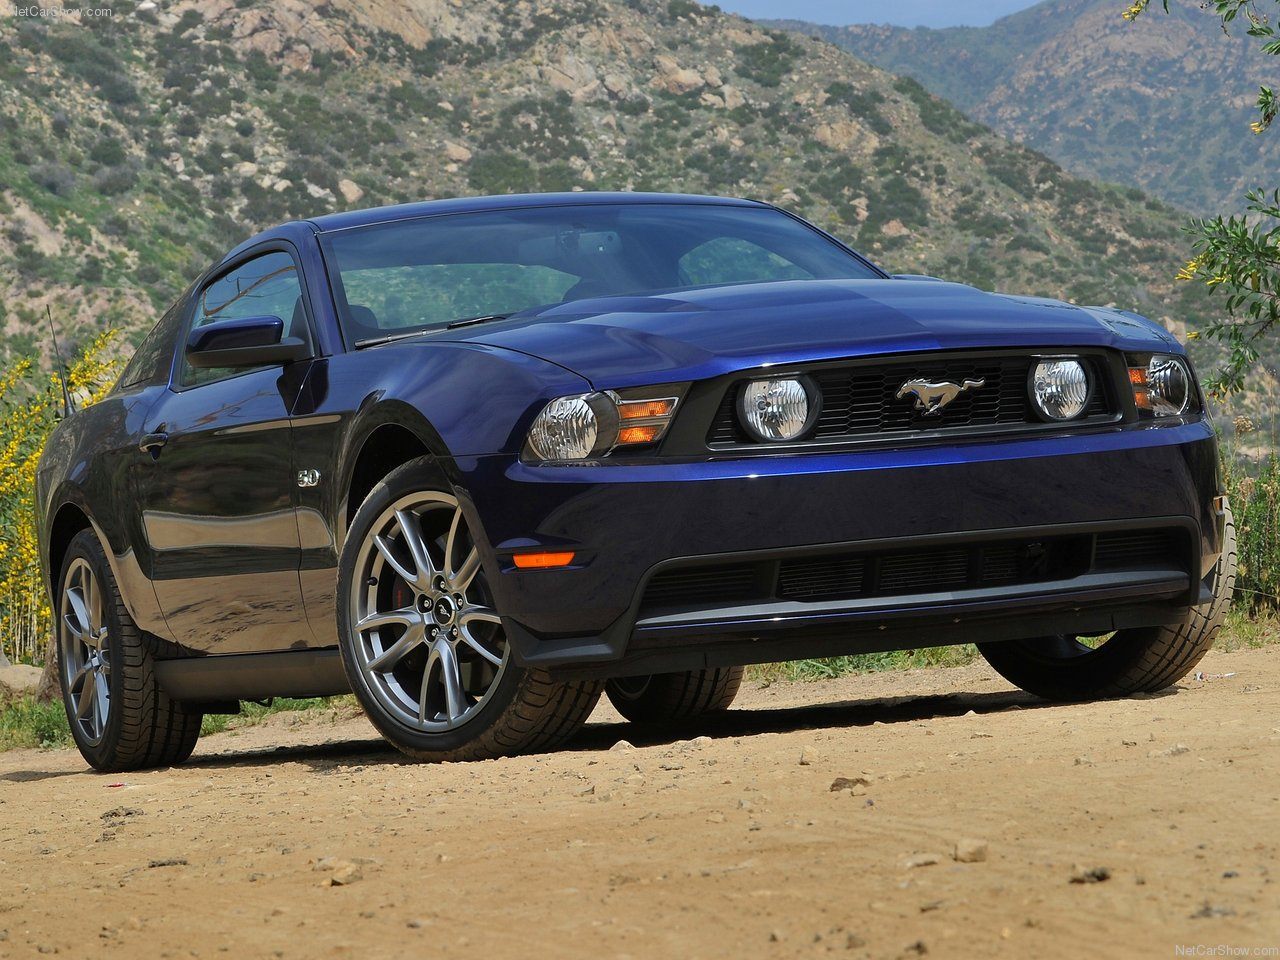 http://2.bp.blogspot.com/-rmPMqOXuLOo/TWZ8SccQEOI/AAAAAAAABIo/Qxt1rGE-Ooc/s1600/Ford-Mustang_GT_2011_1280x960_wallpaper_06.jpg